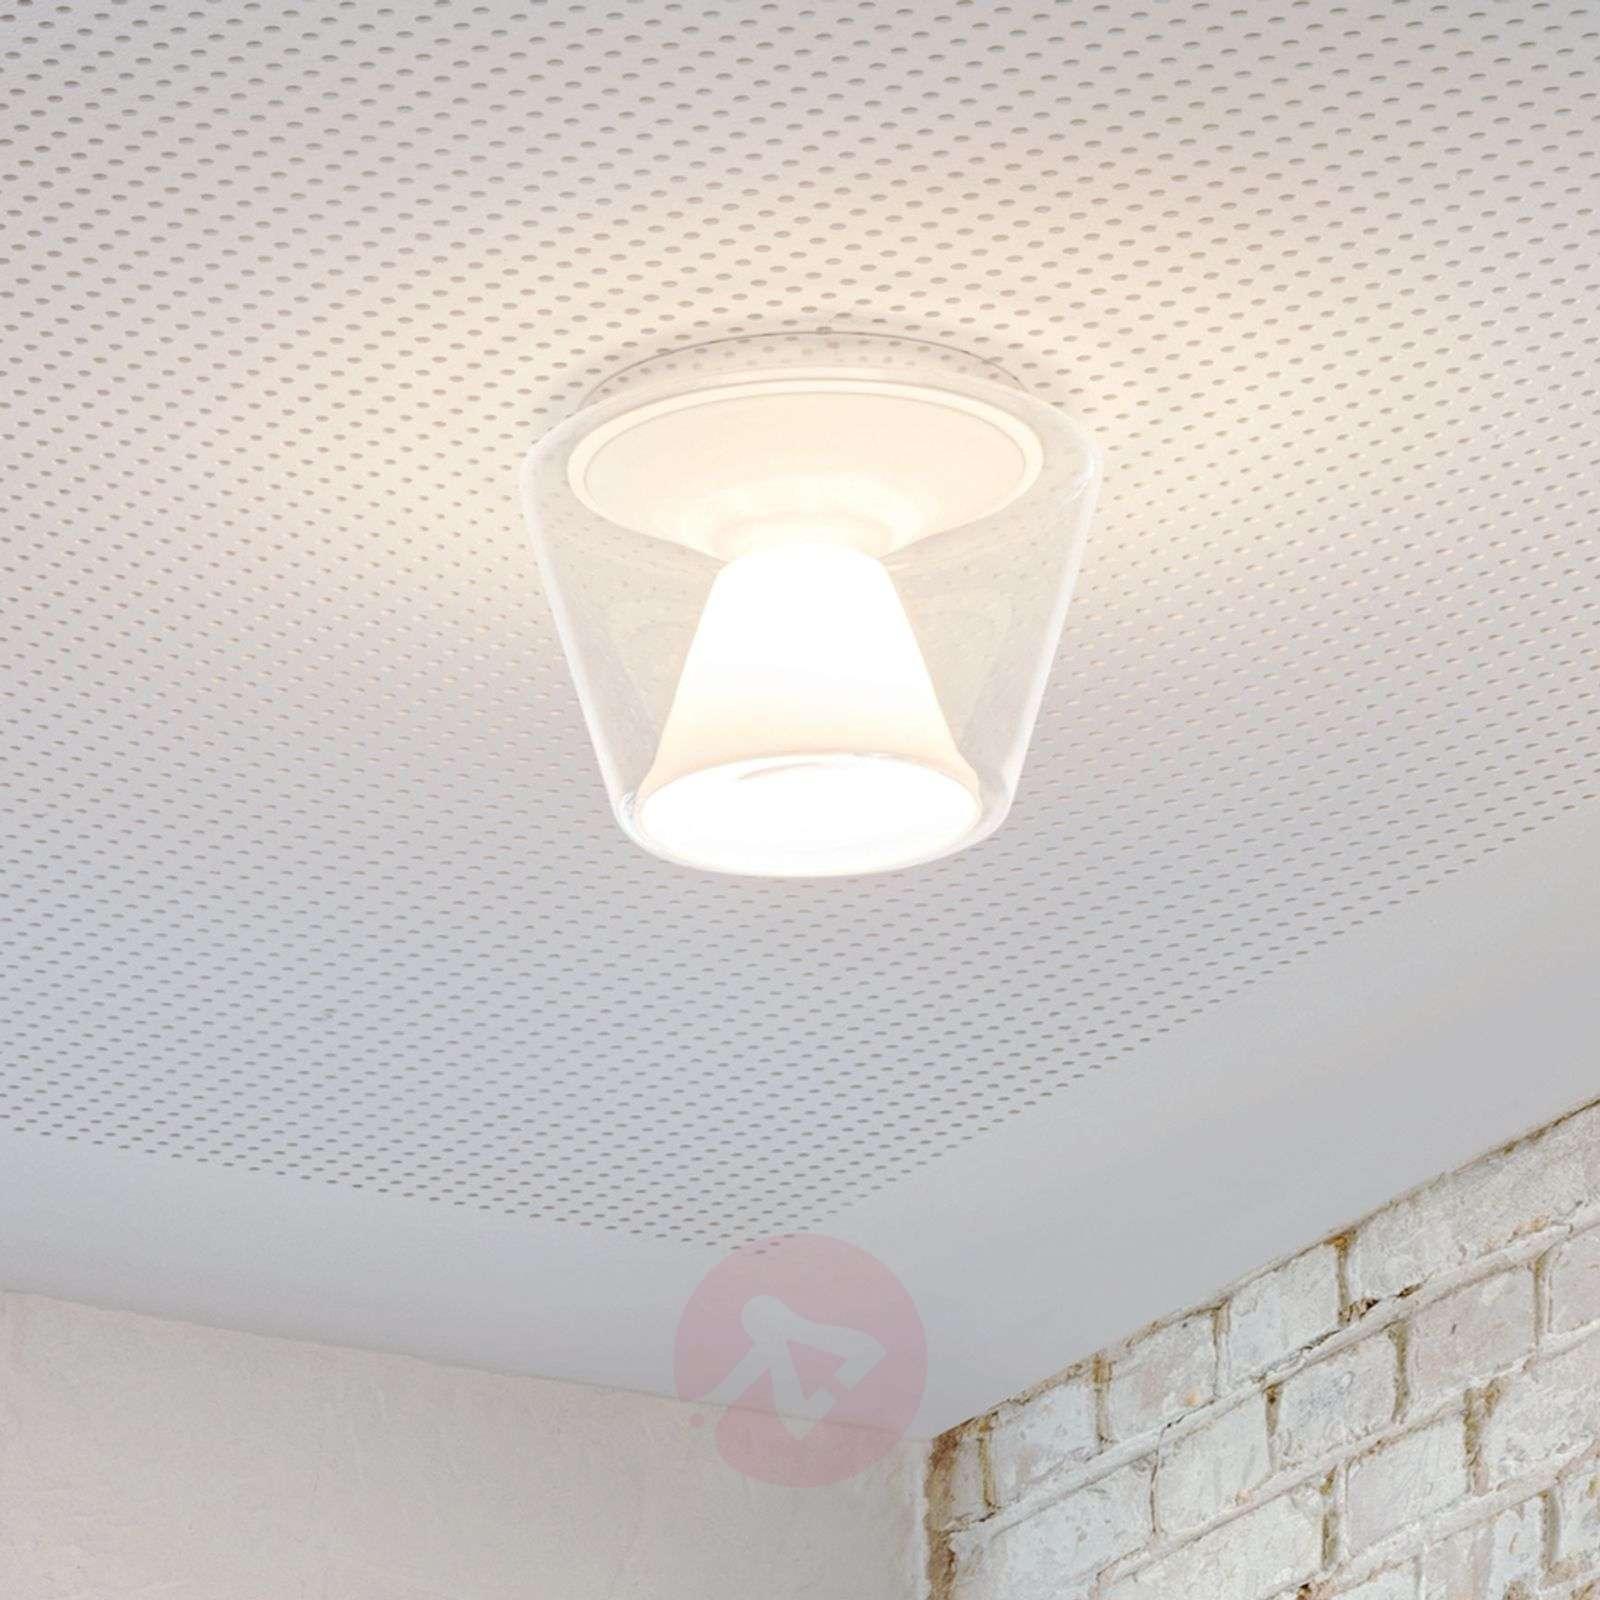 Suupuhallettu LED-design-kattovalaisin Annex-8550011-01